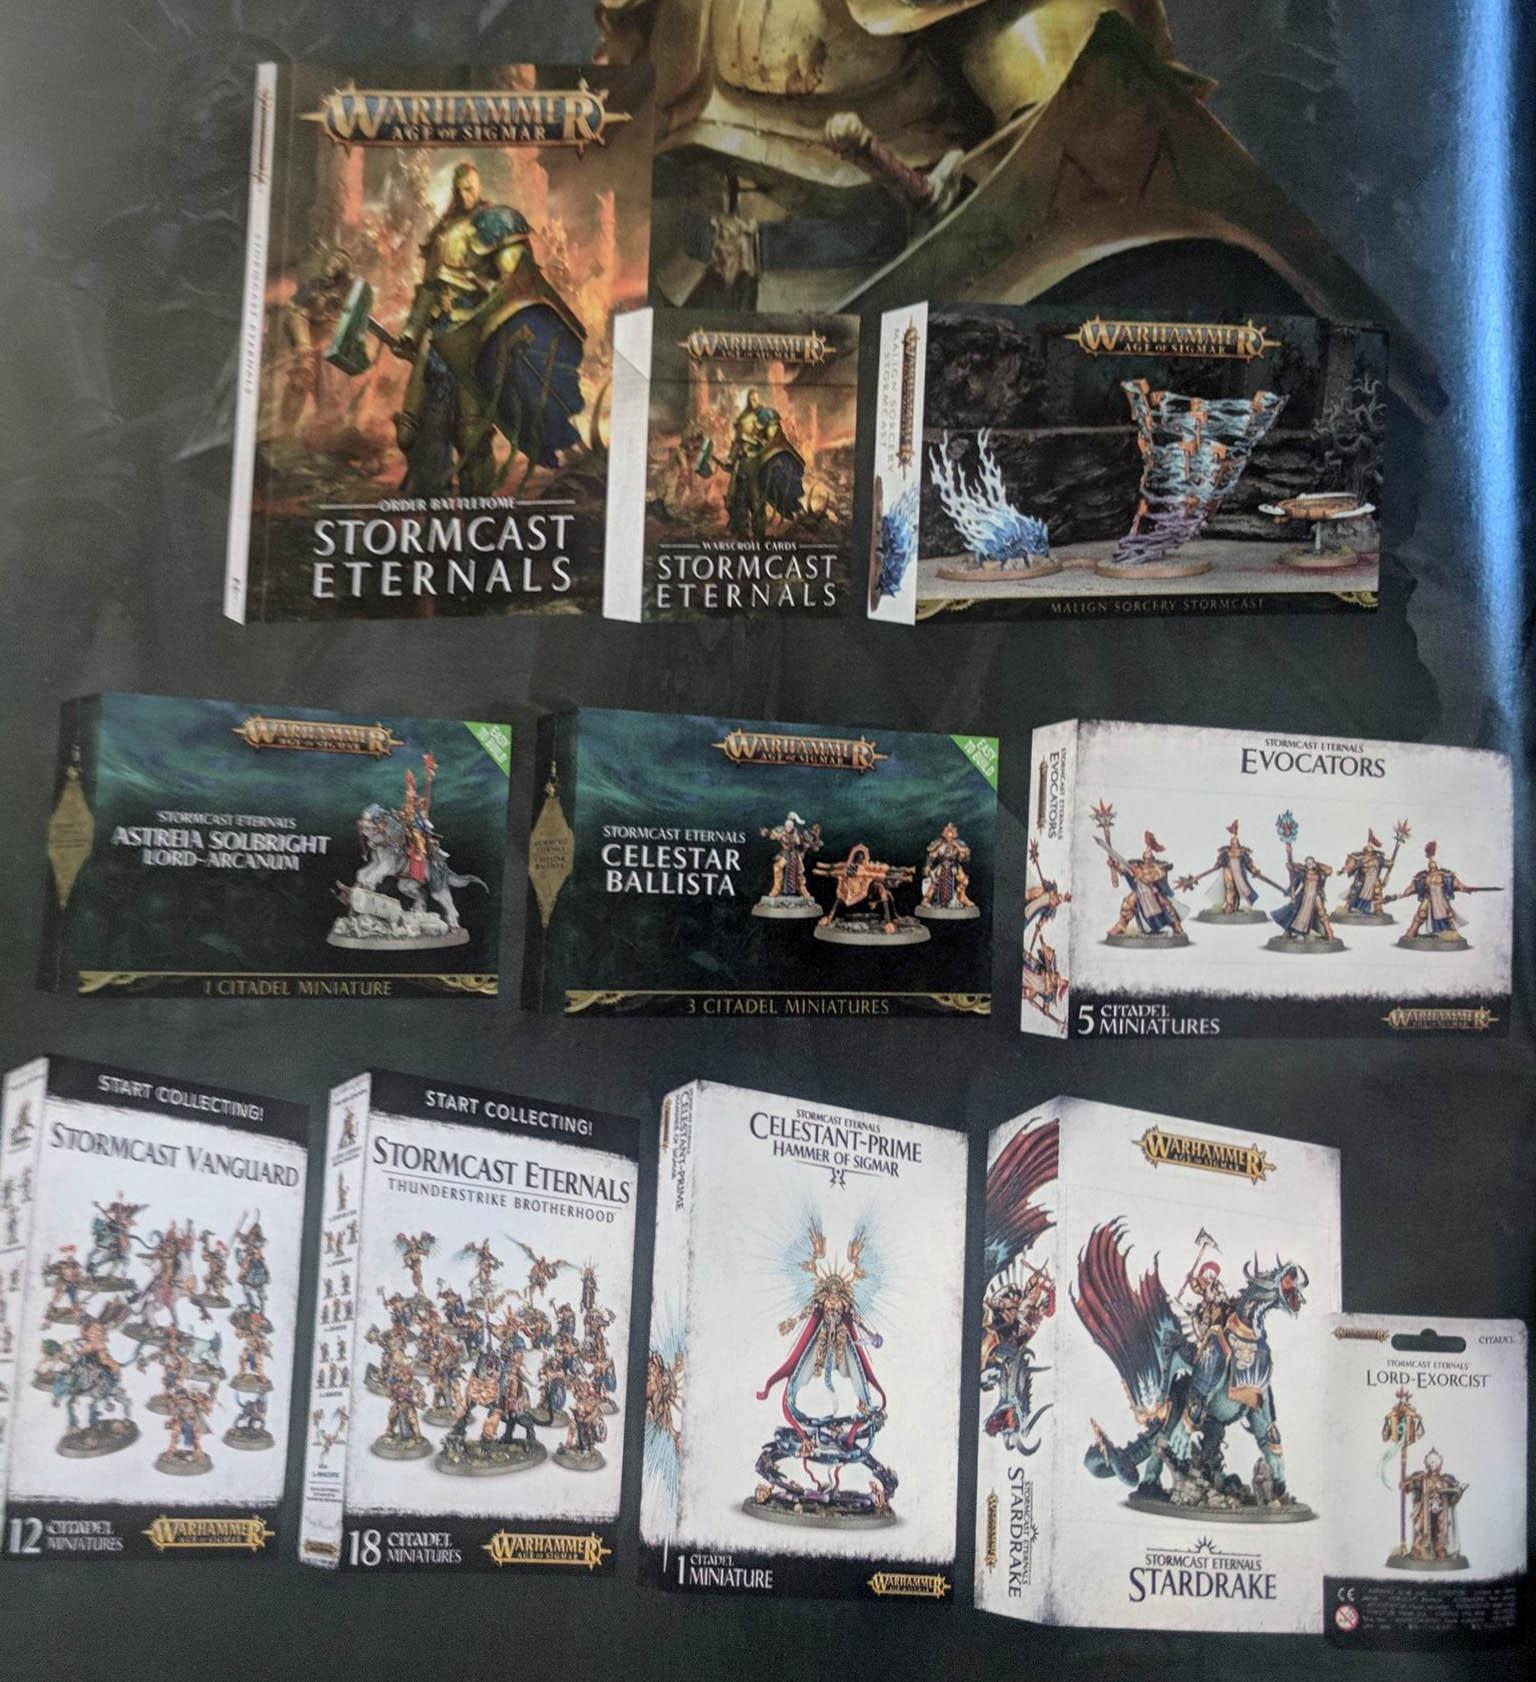 Warhammer Age Of Sigmar Dreadblade Harrows ... Games Workshop Easy to Build